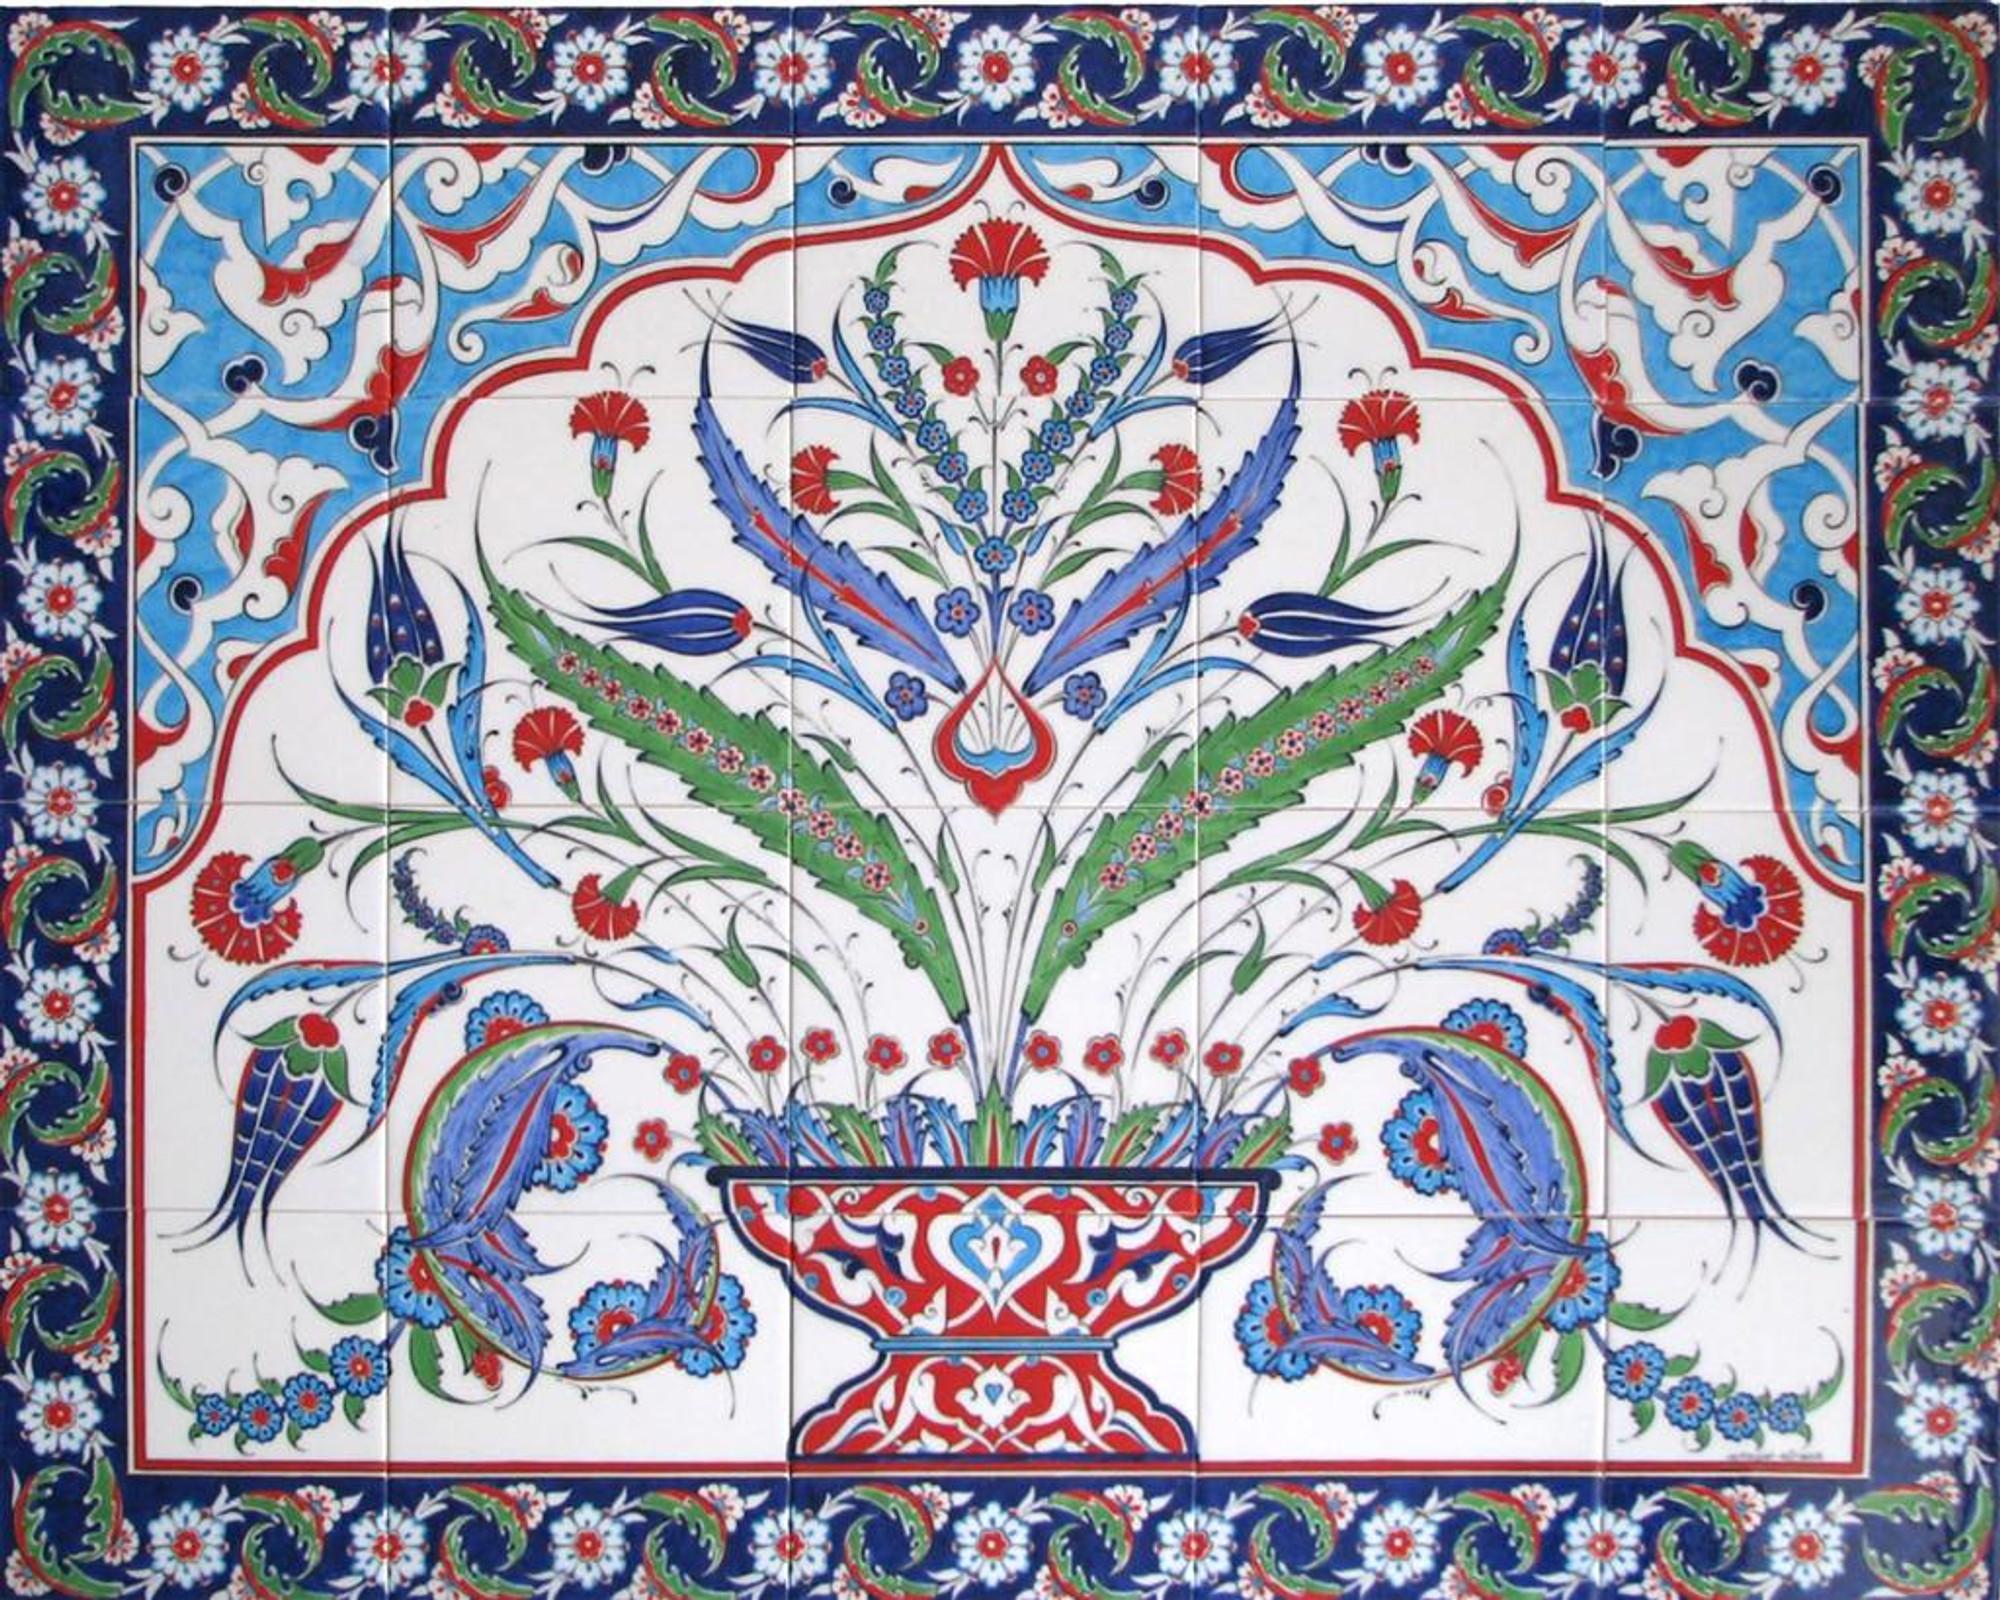 hand painted iznik turkish tiles and tile panels quick shop 100x80cm fountainhead ceramic tile mural backsplash